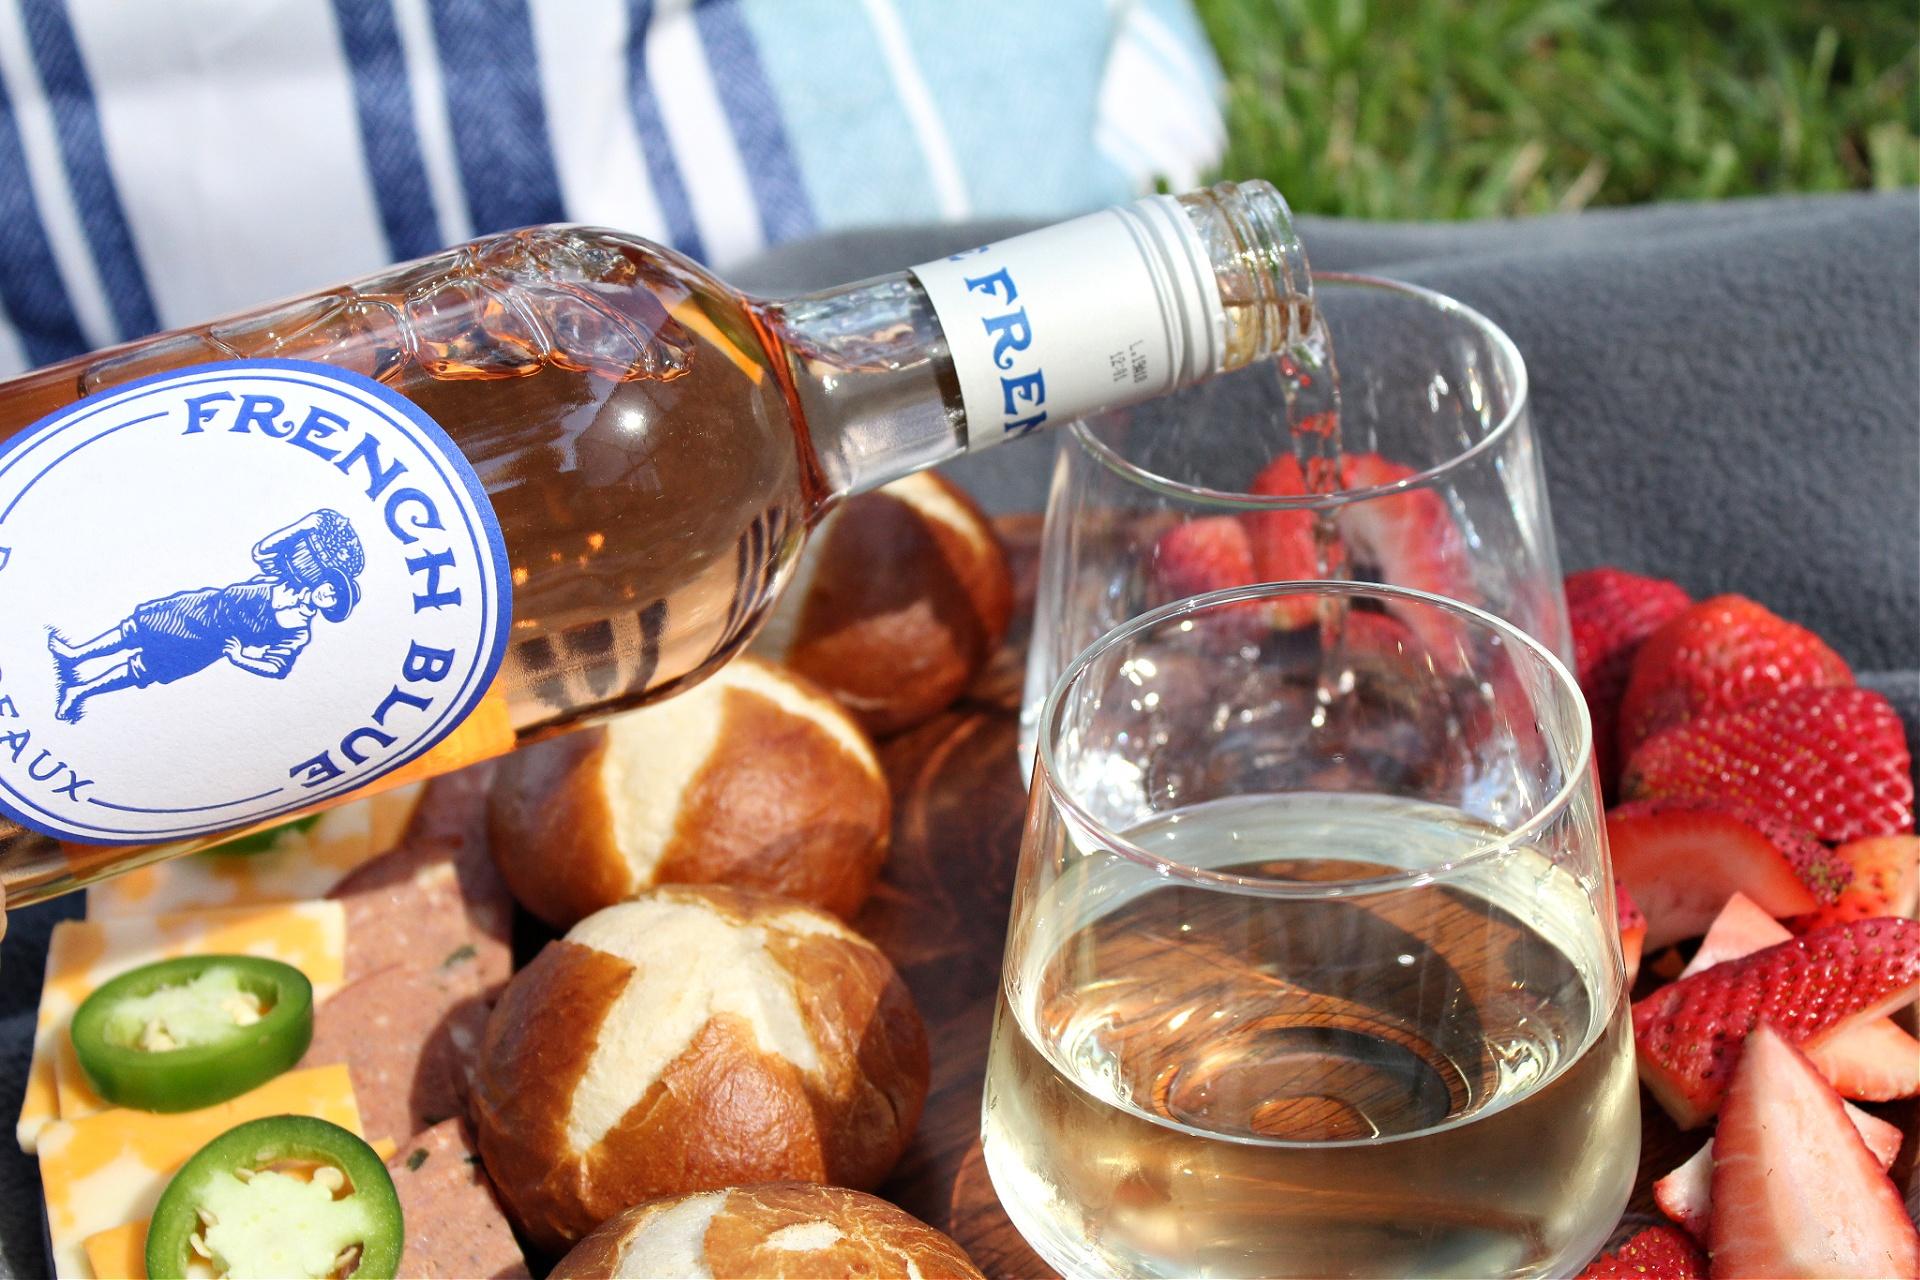 Best Picnic White Wines